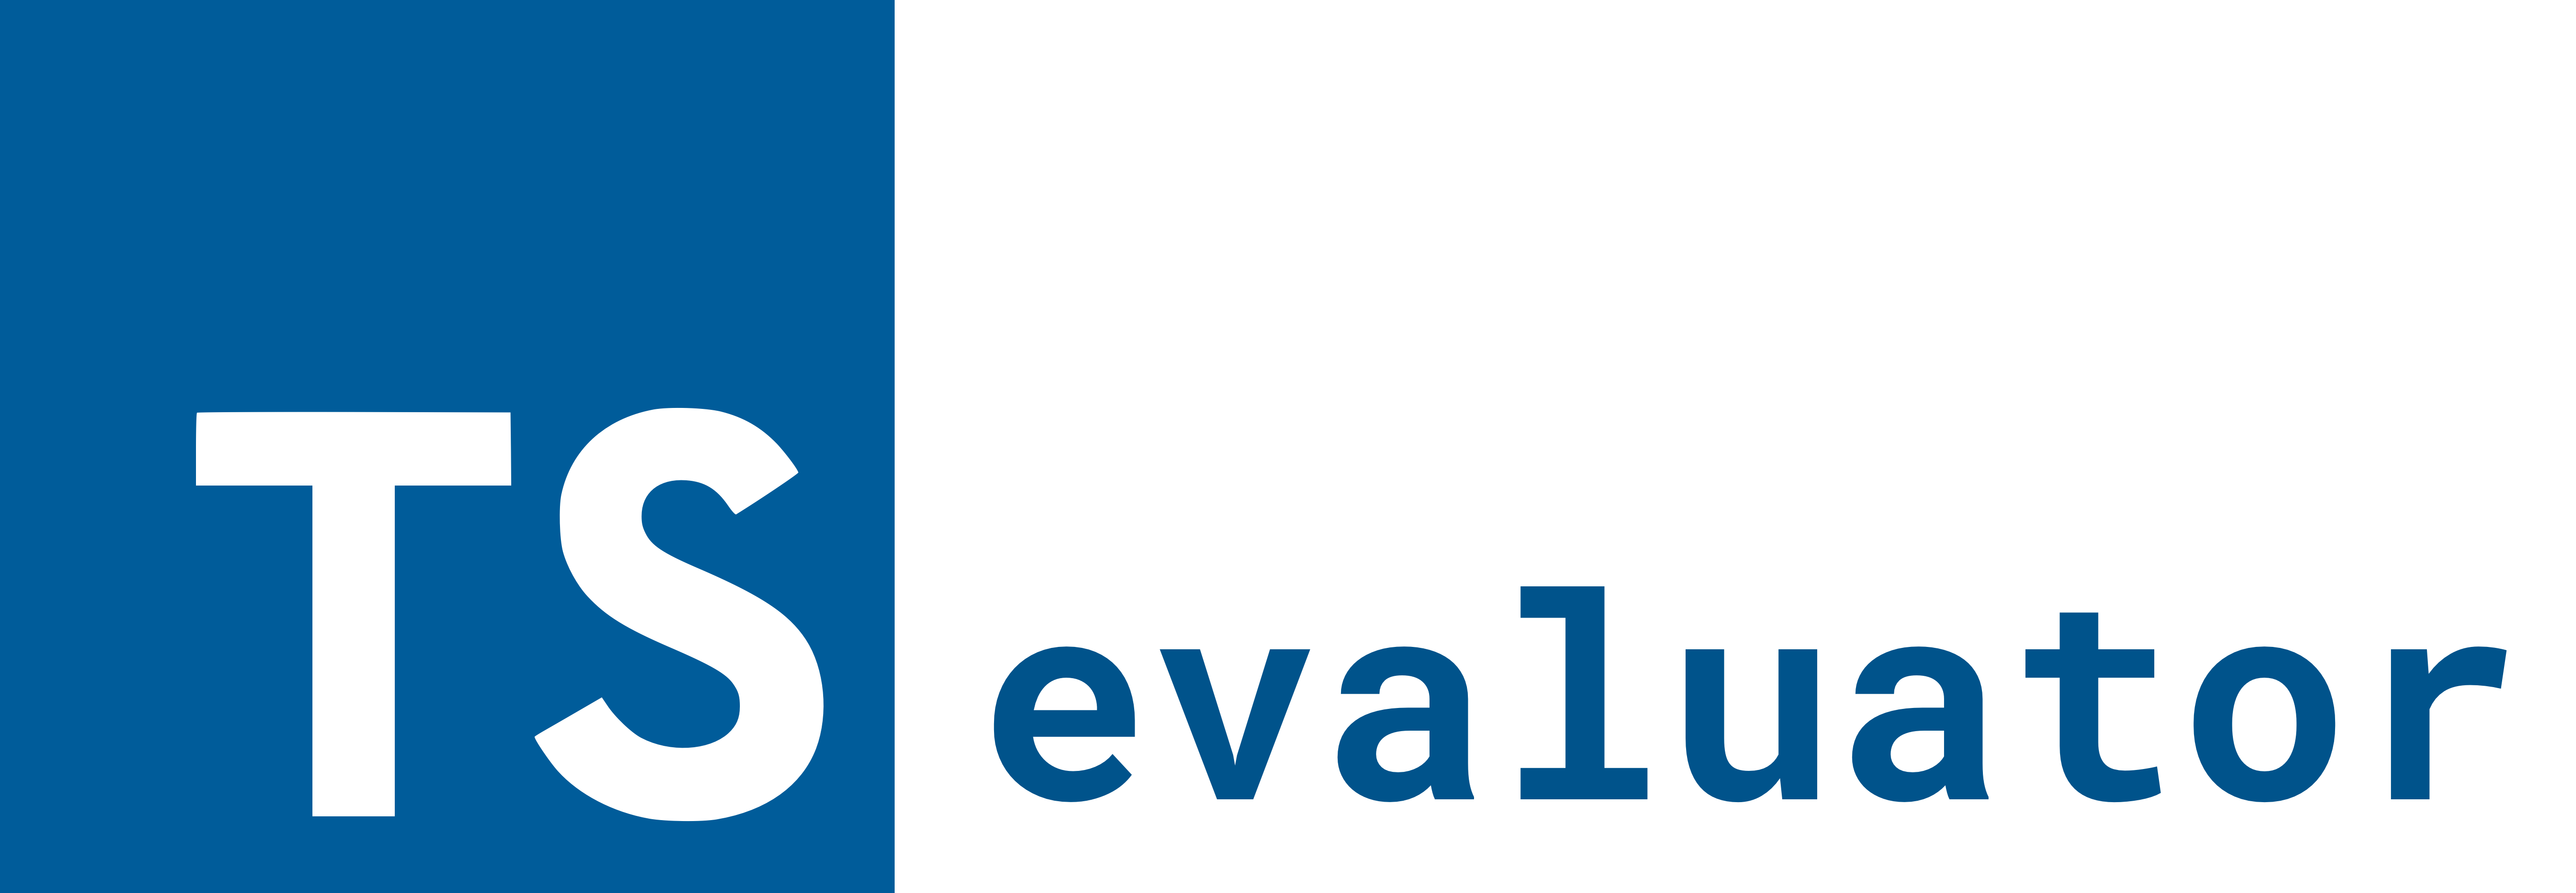 wessberg/ts-evaluator - npm